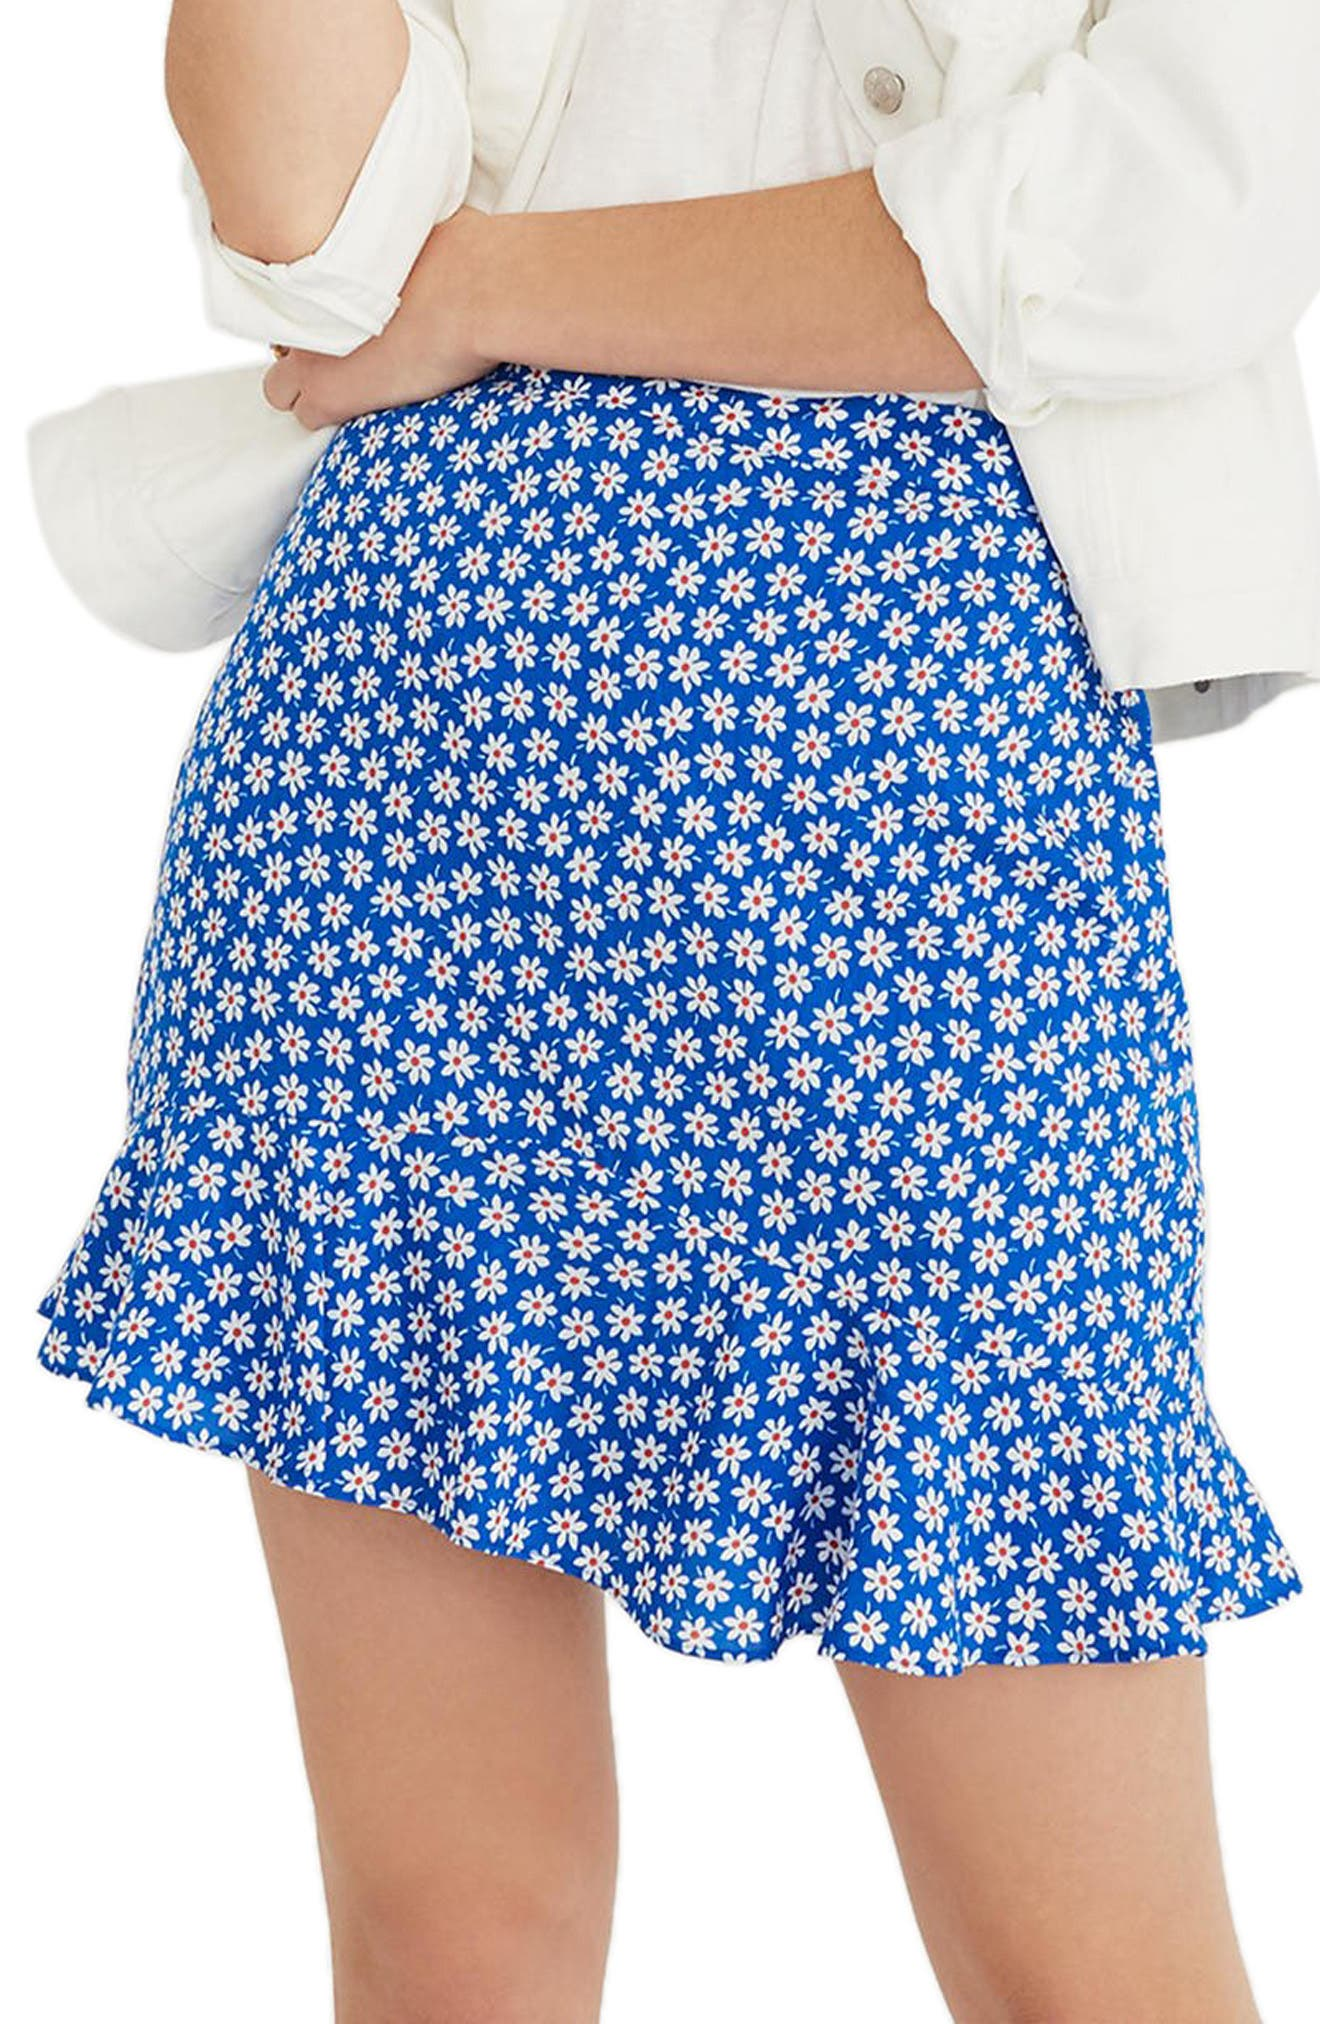 Daisy Print Ruffle Miniskirt,                         Main,                         color, BRILLIANT ROYAL